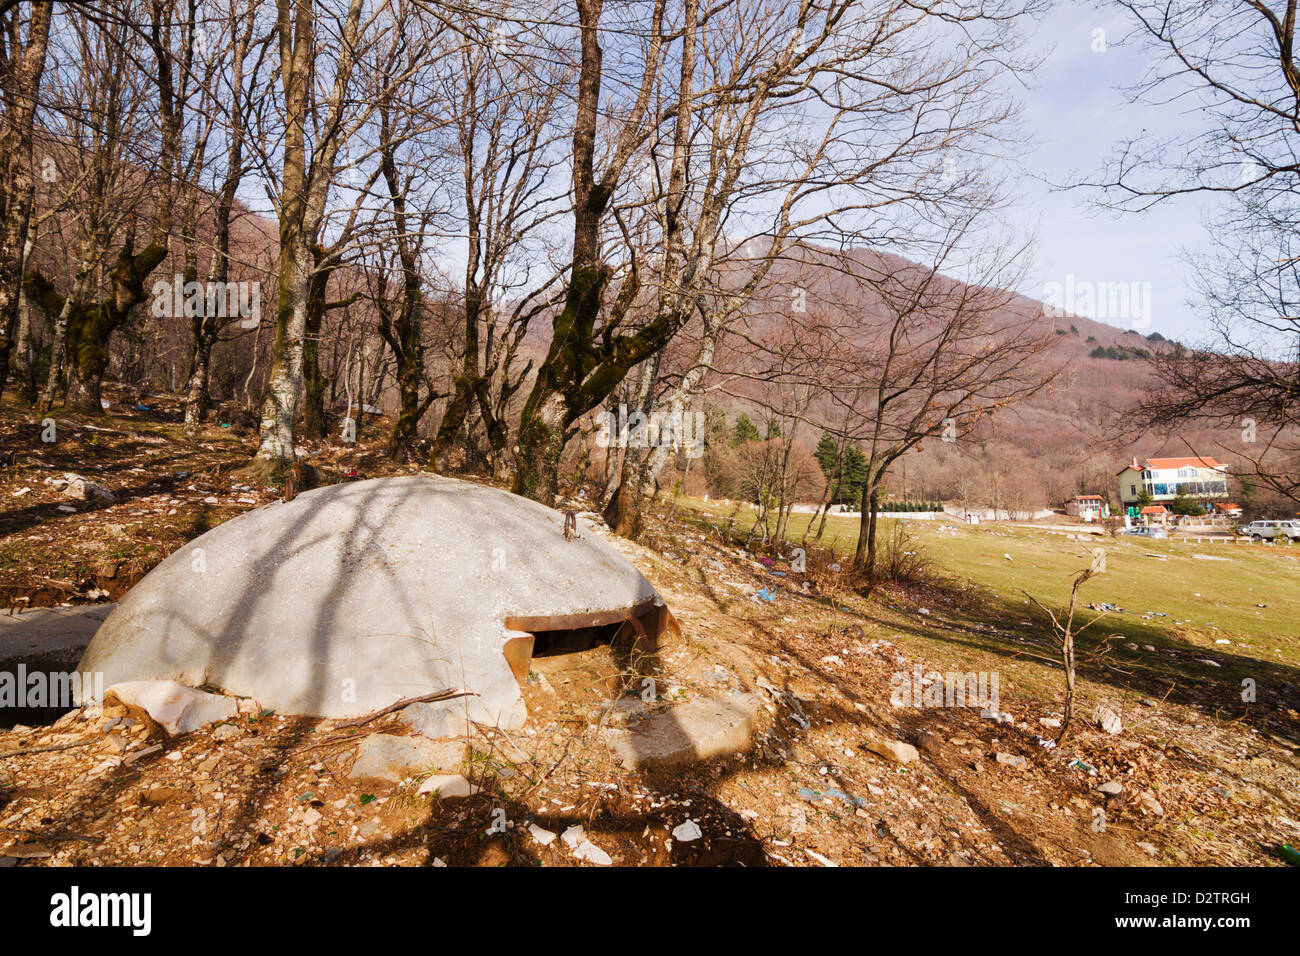 Old bunker at the Dajti massive near Tirana, Albania - Stock Image